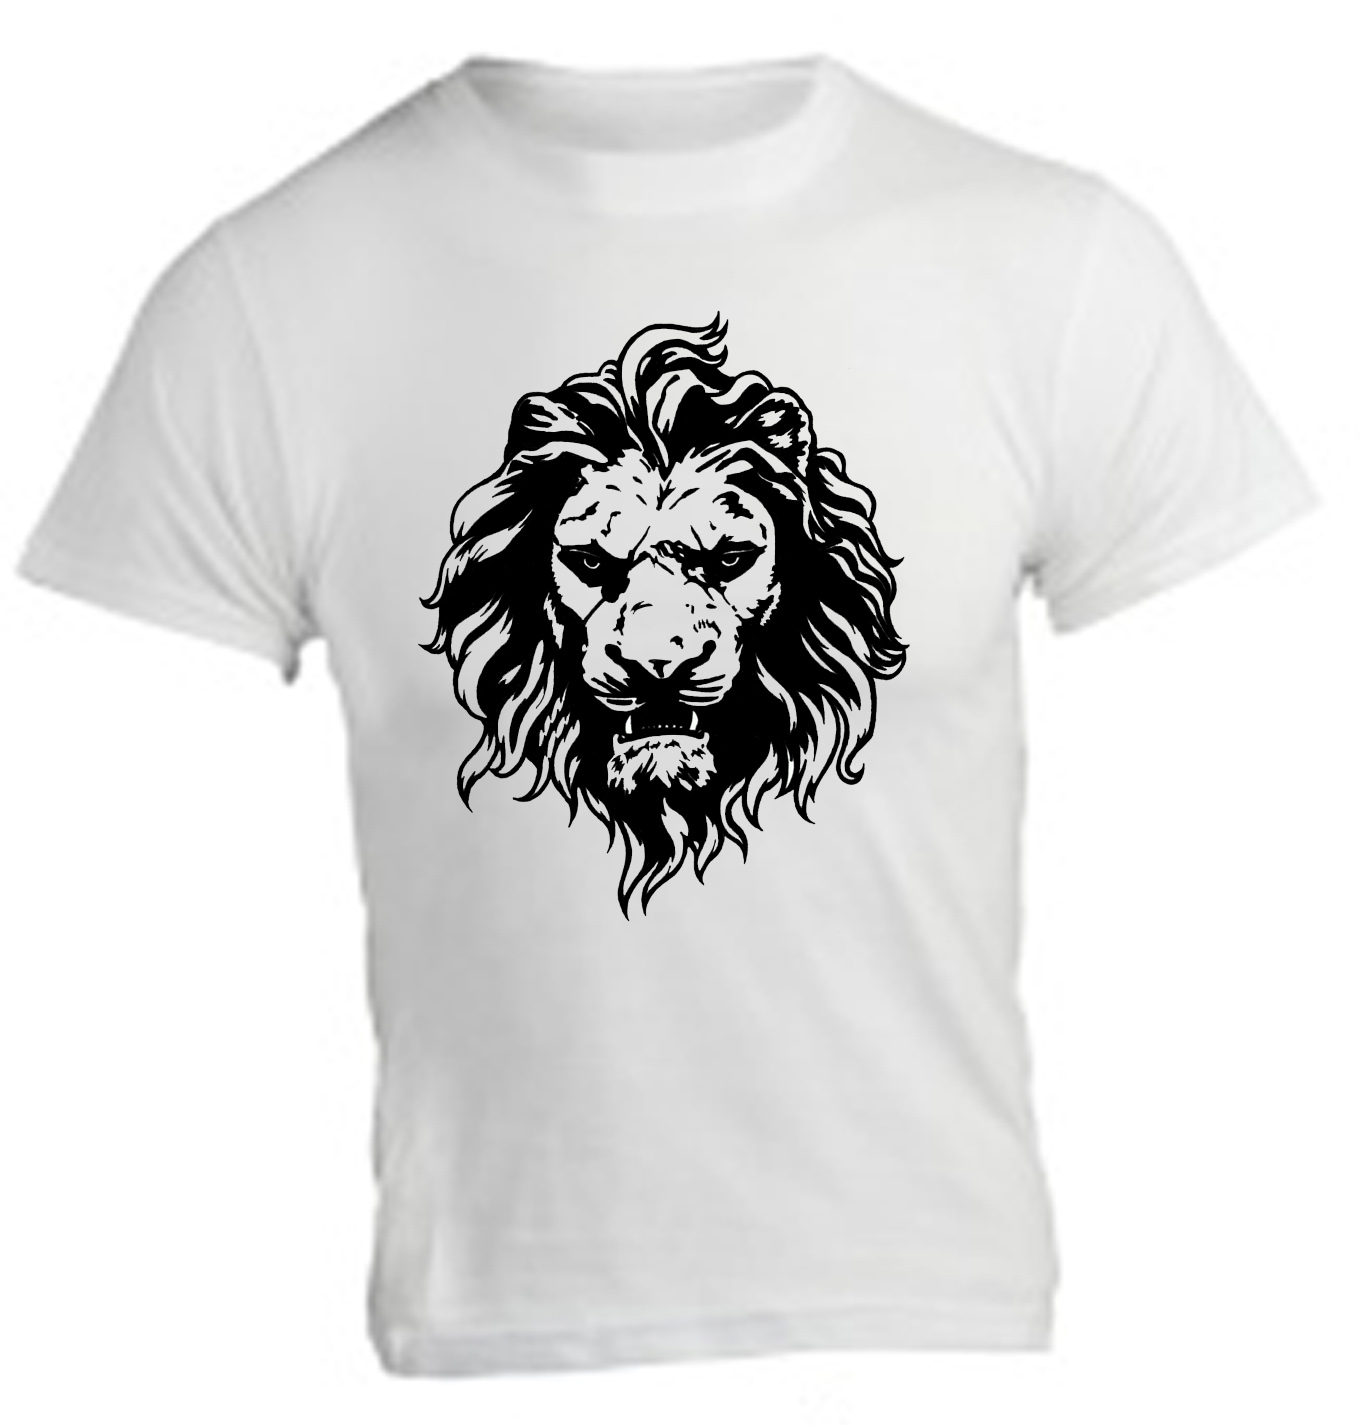 whiteT_lionofjudah_mod